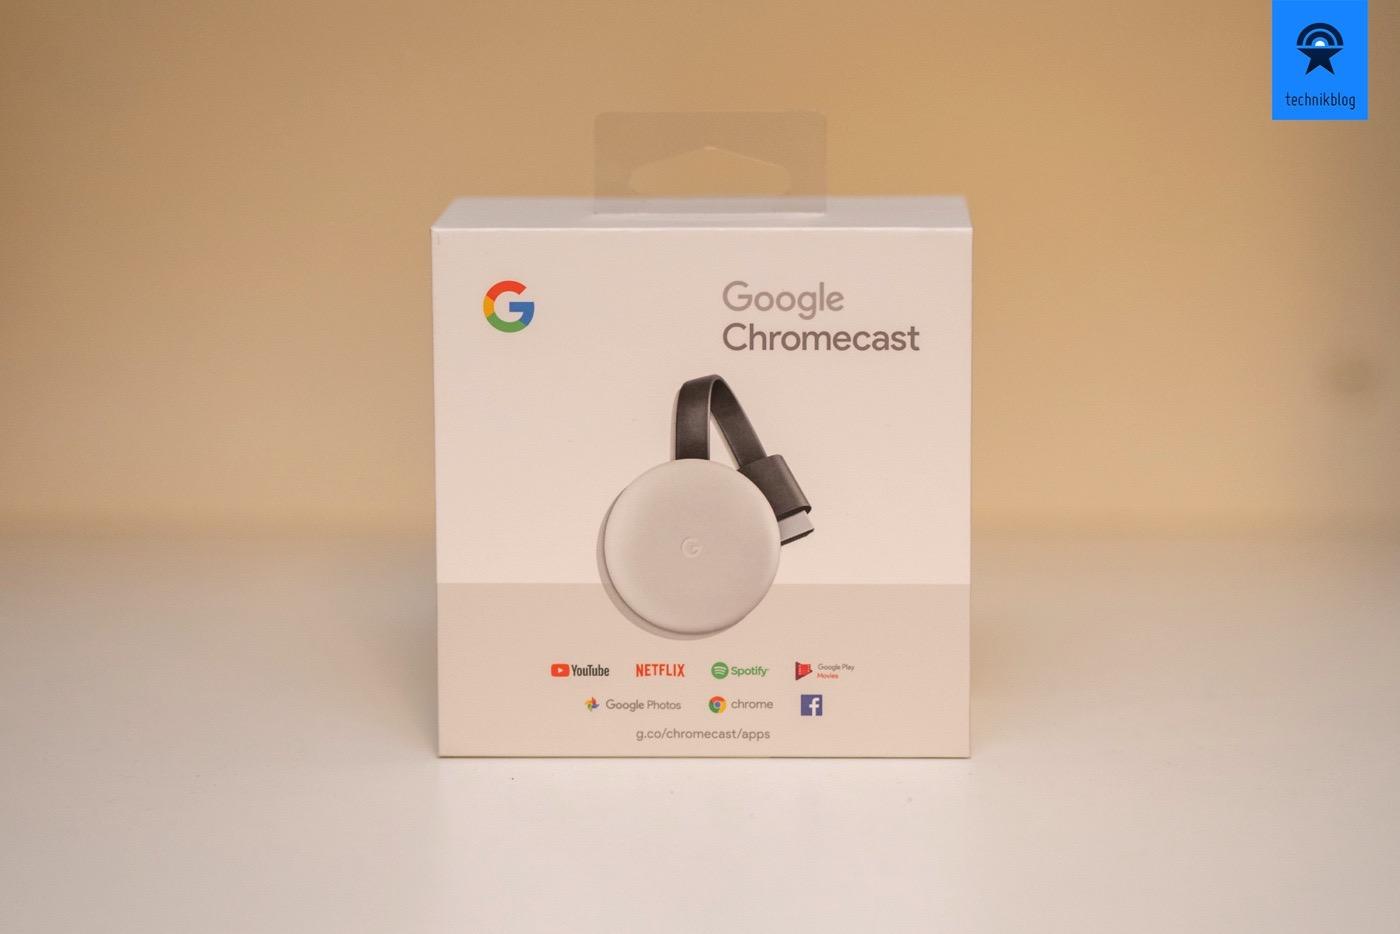 Neuer Google Chromecast